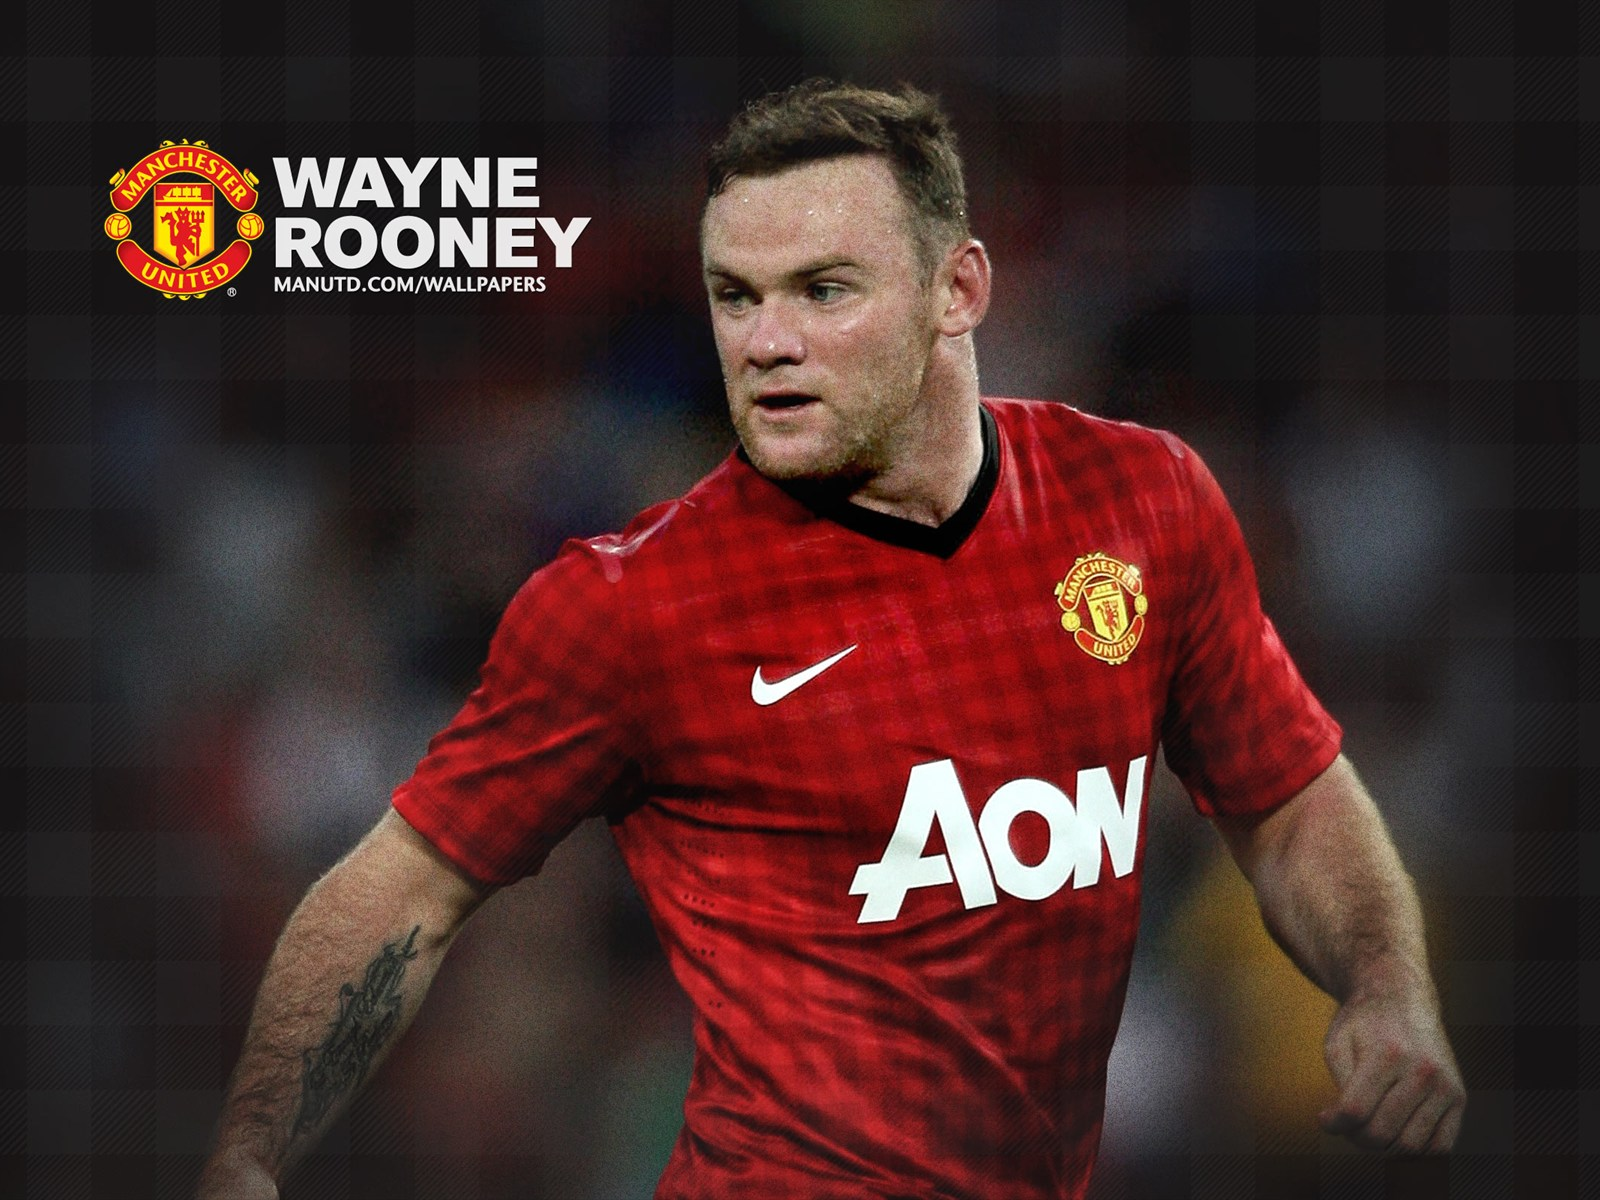 Wayne Rooney Profile profil lengkap penyerang manchester united wayne rooney wayne